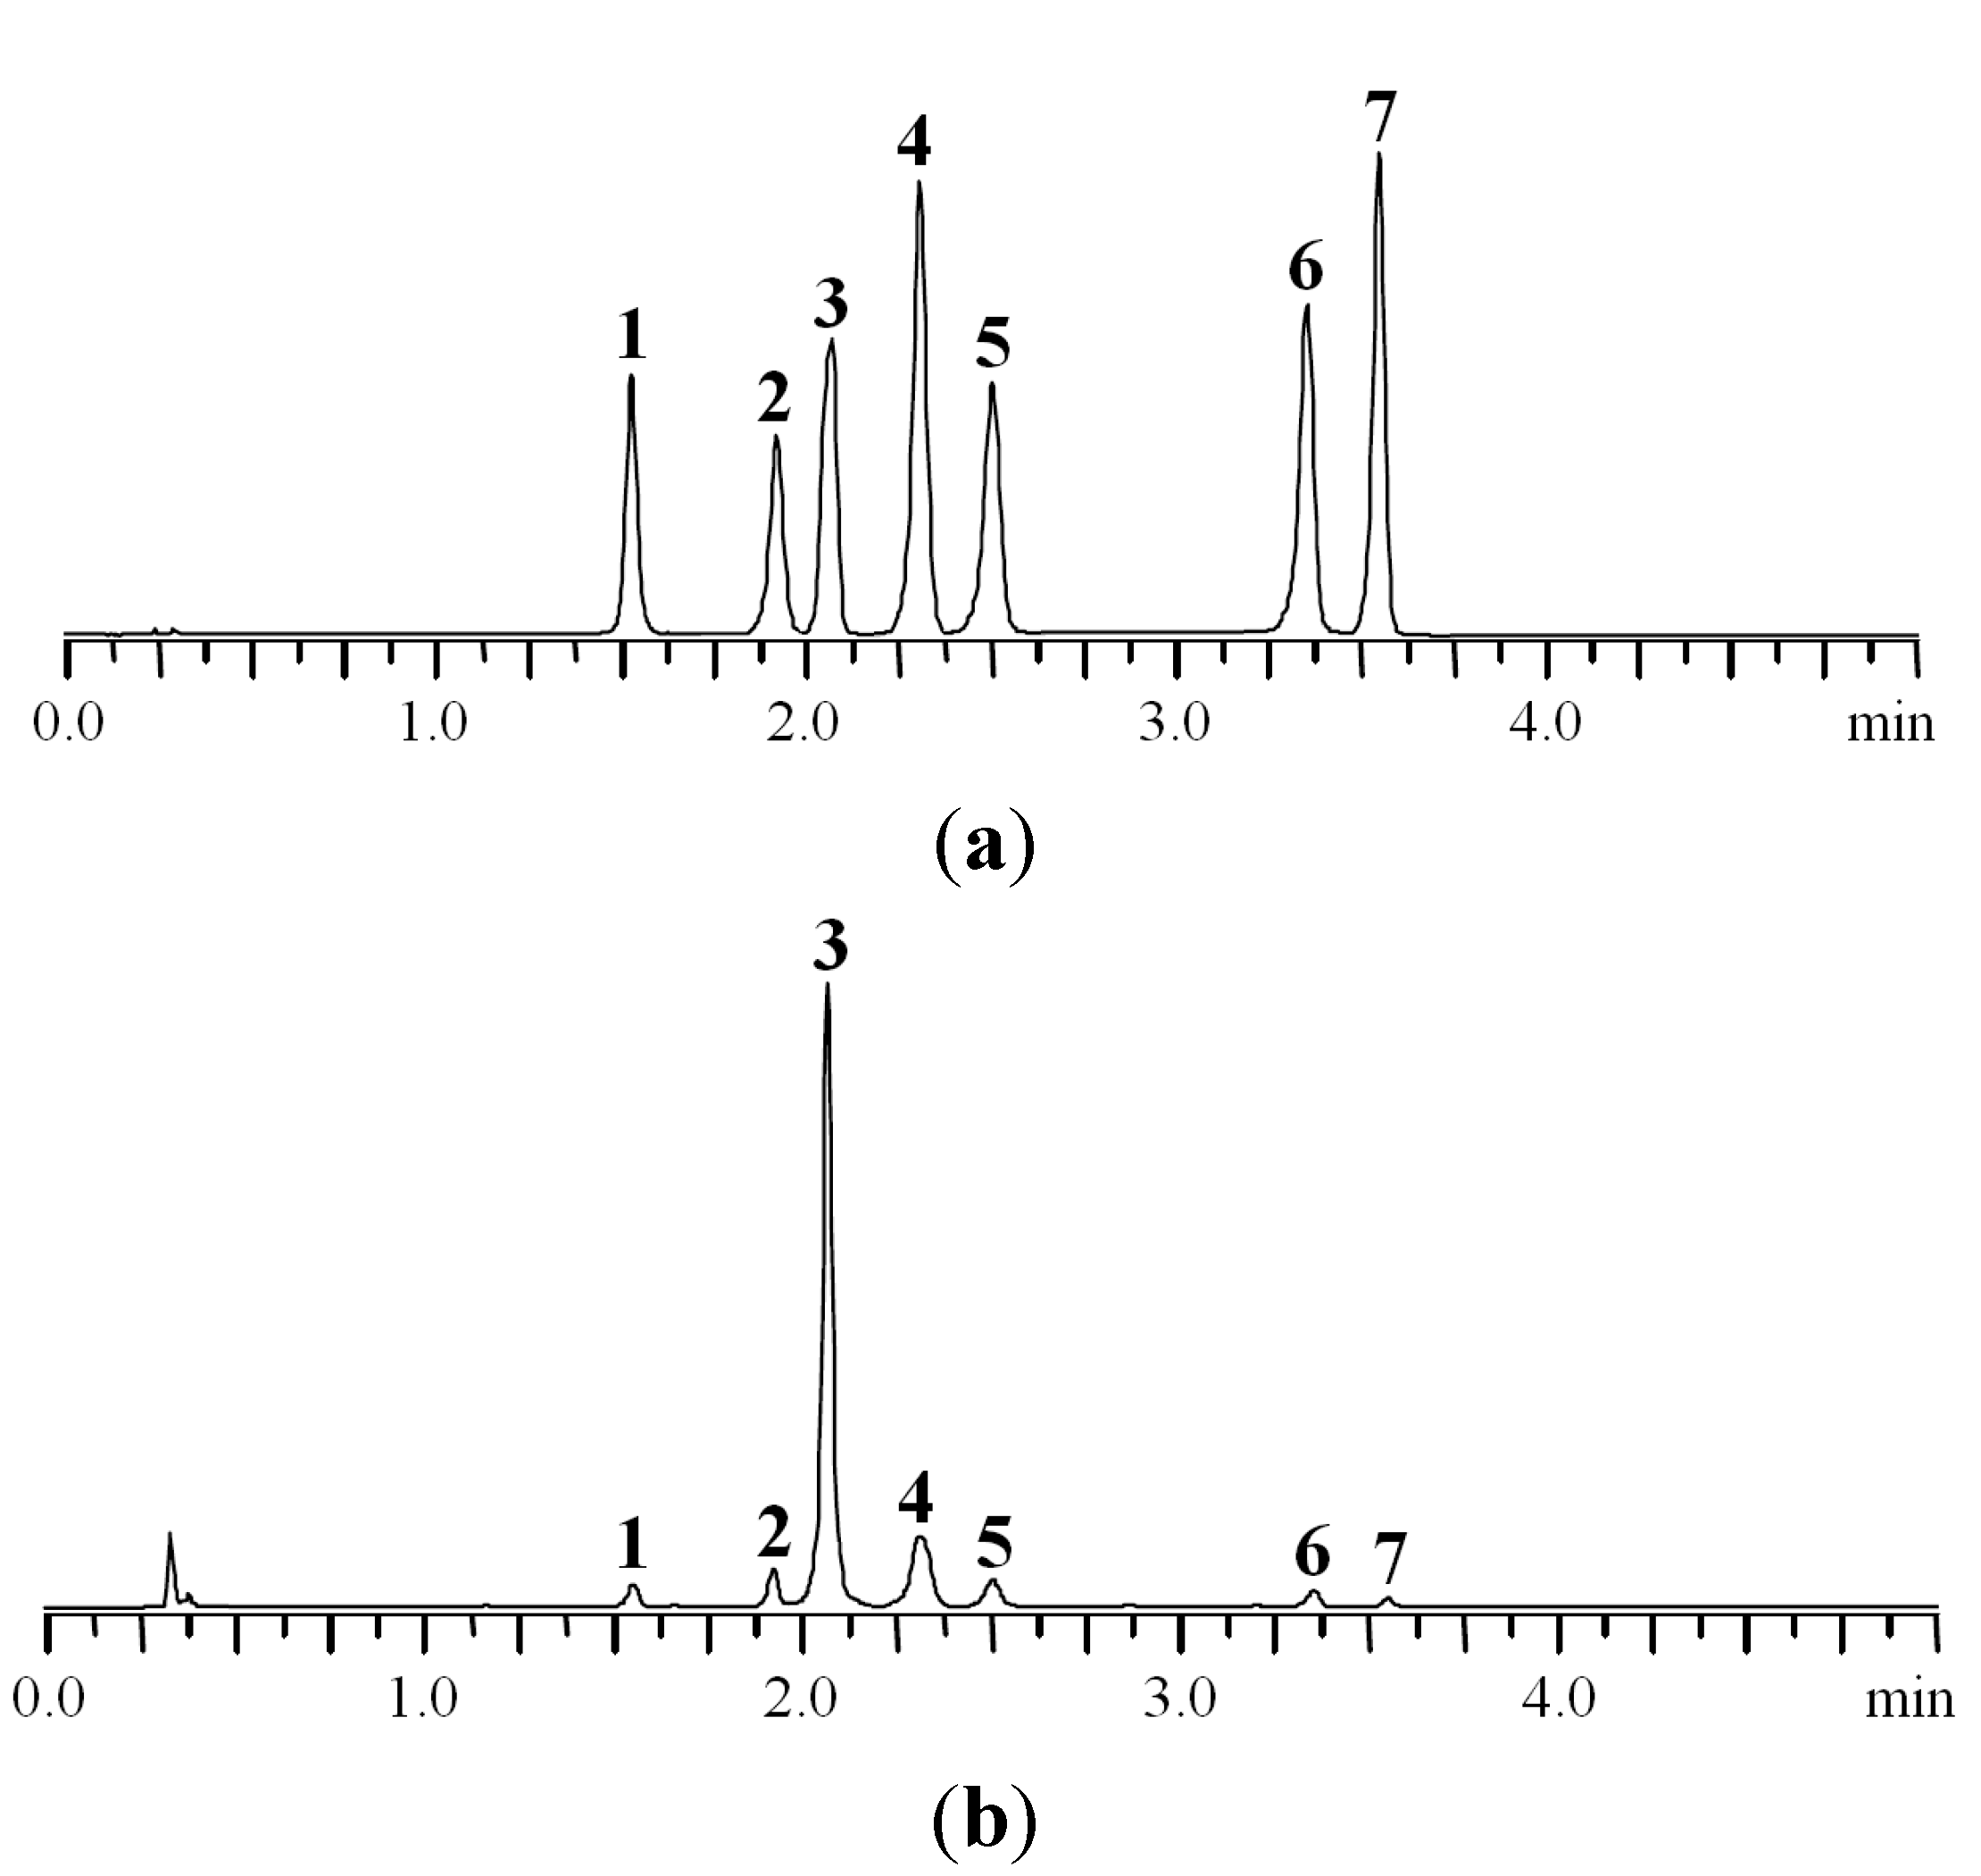 rp hplc uv method for simultaneous estimation of ceftriaxone An rp hplc method for simultaneous estimation of ceftriaxone sodium and an isocratic liquid chromatographic method with uv detection at 230 nm is described for simultaneous determination of method for the simultaneous estimation of ceftriaxone sodium and.